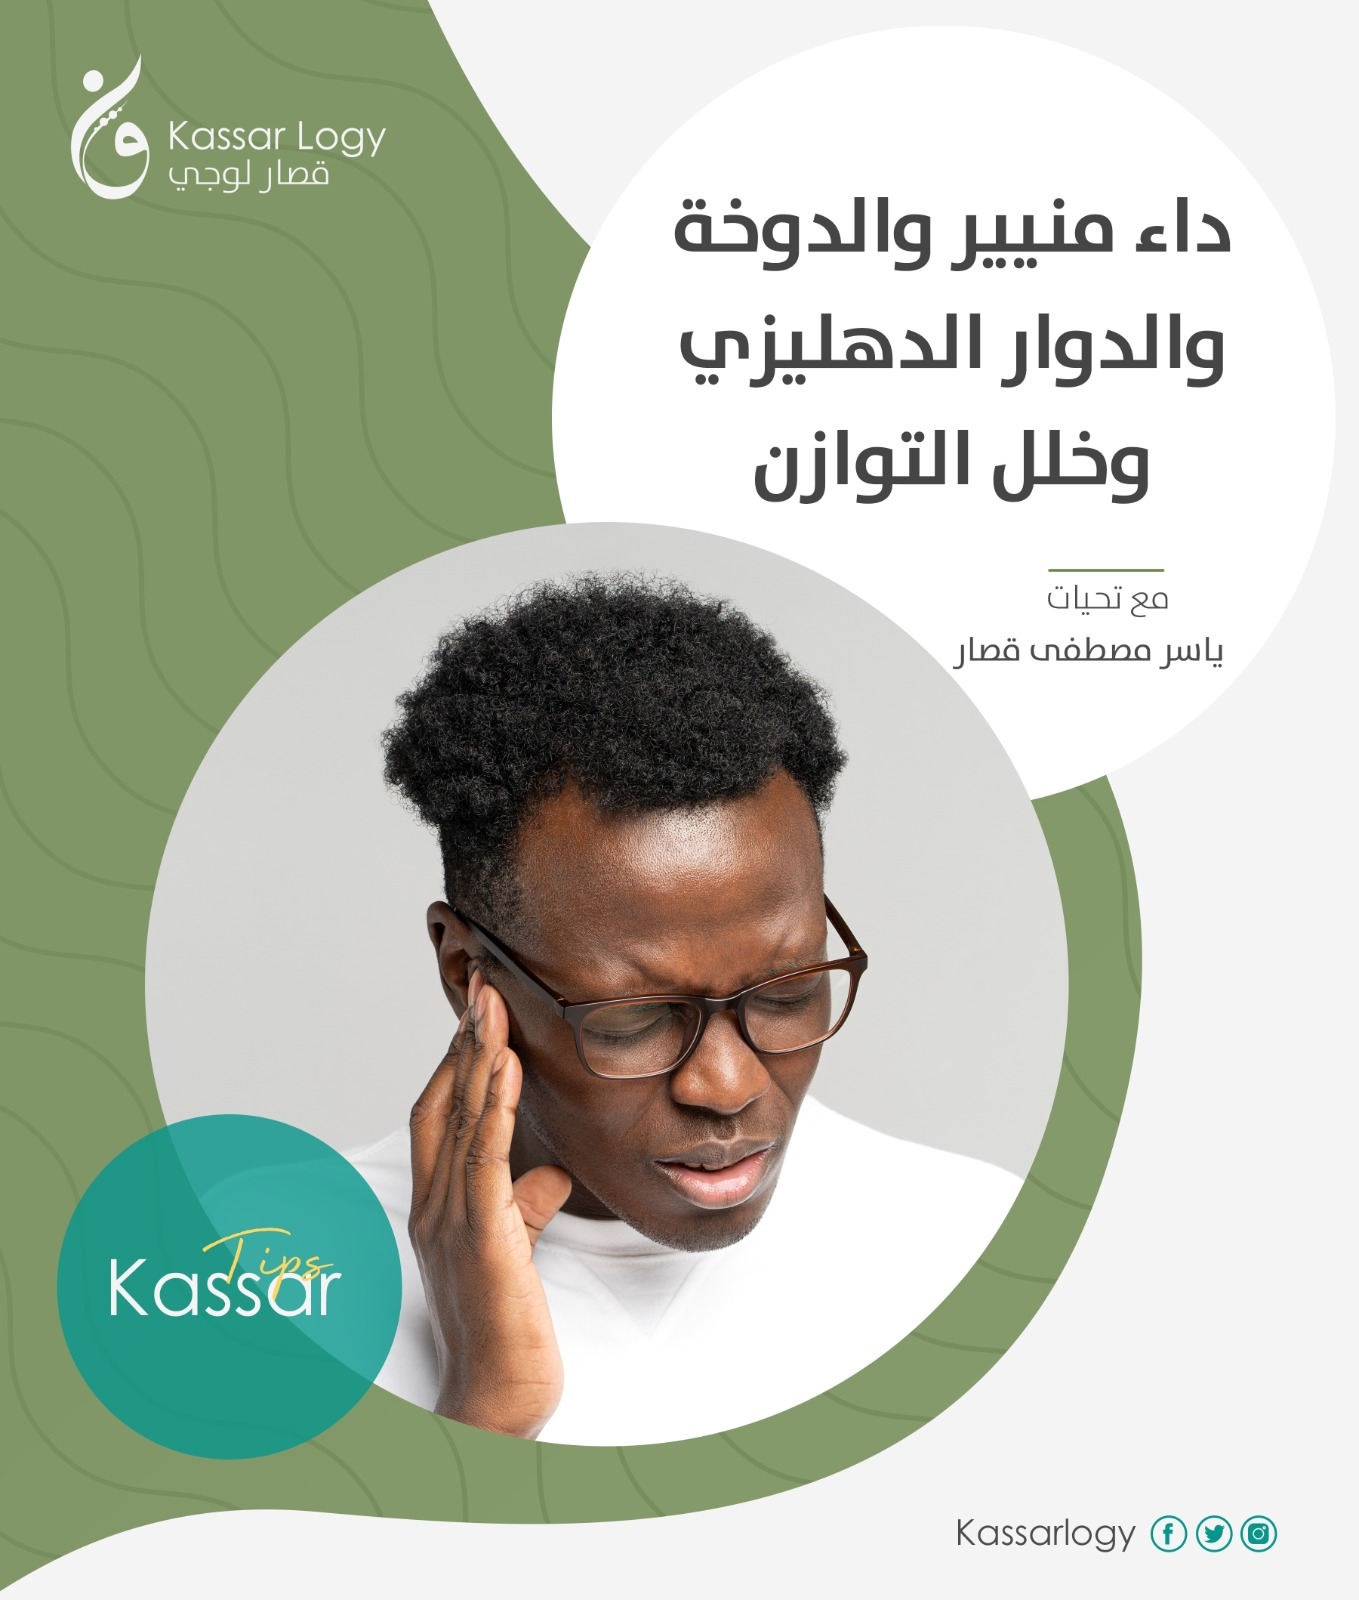 قصار لوجي | Kassar Logy